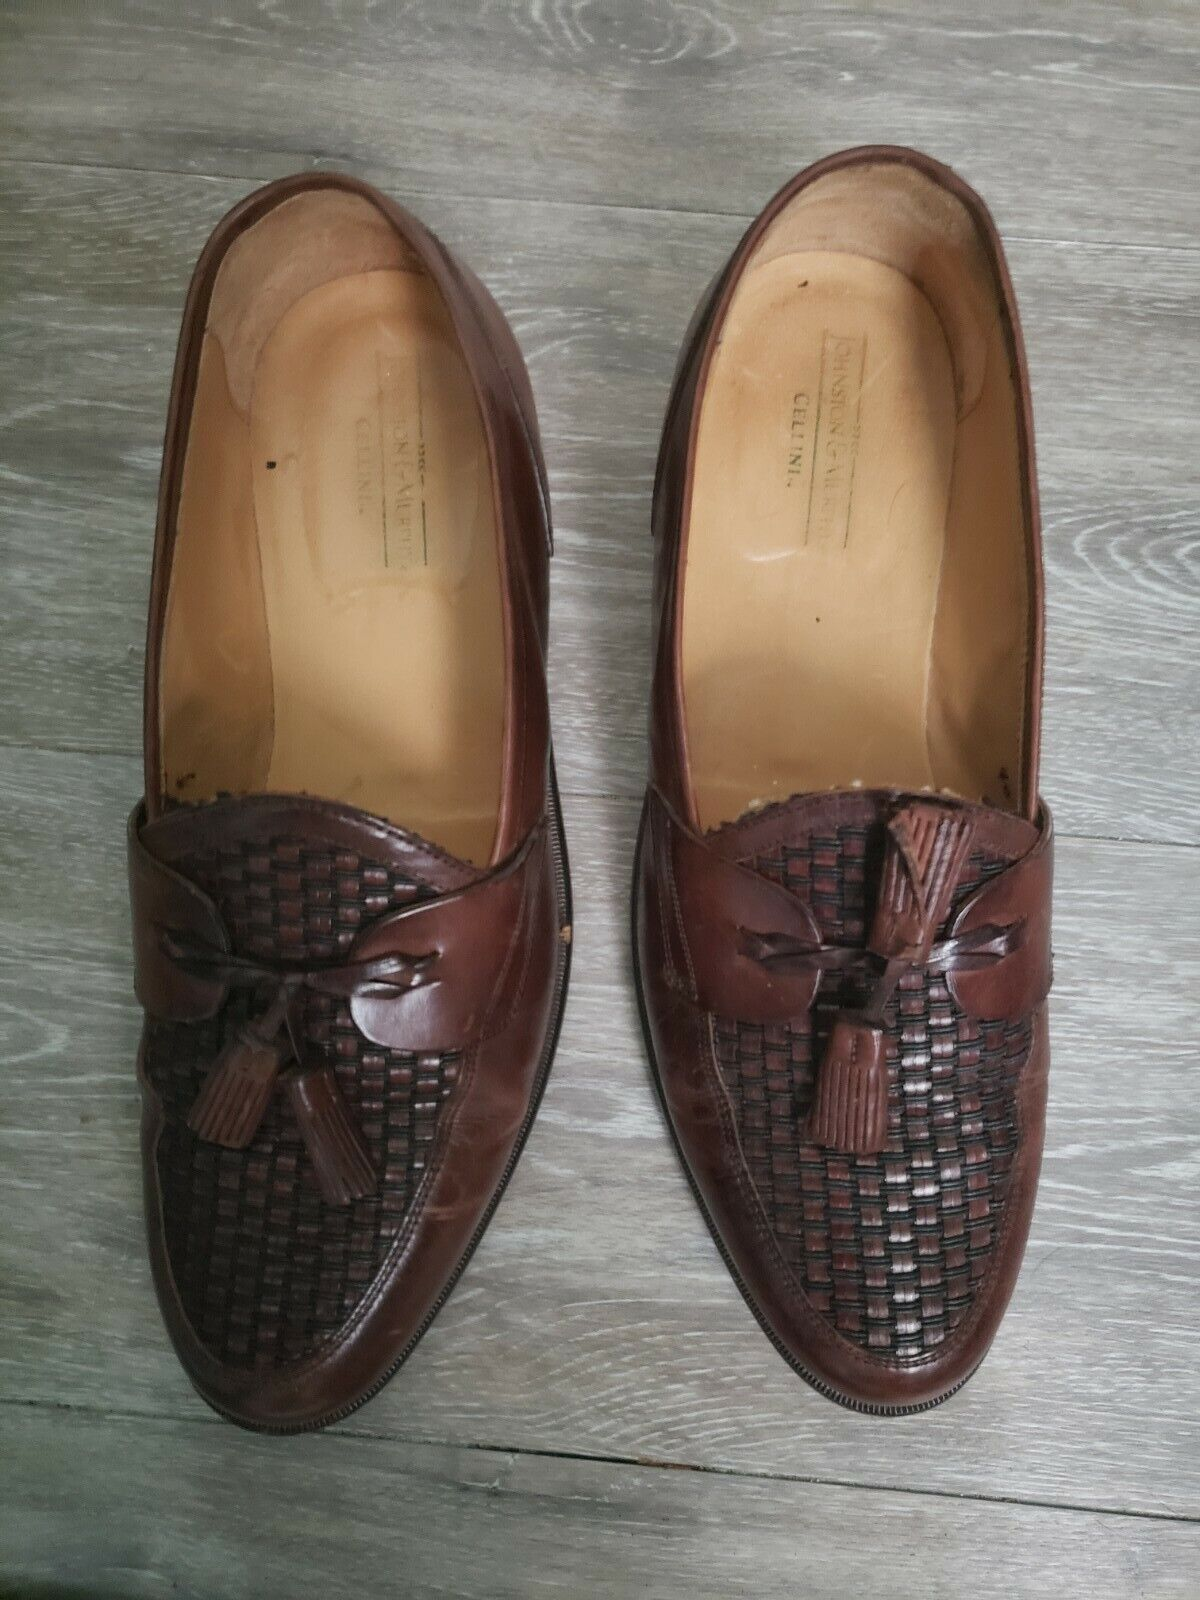 Johnston & Murphy Celini Brown Leather Weave Tassel Loafers Men's 12 M see desp